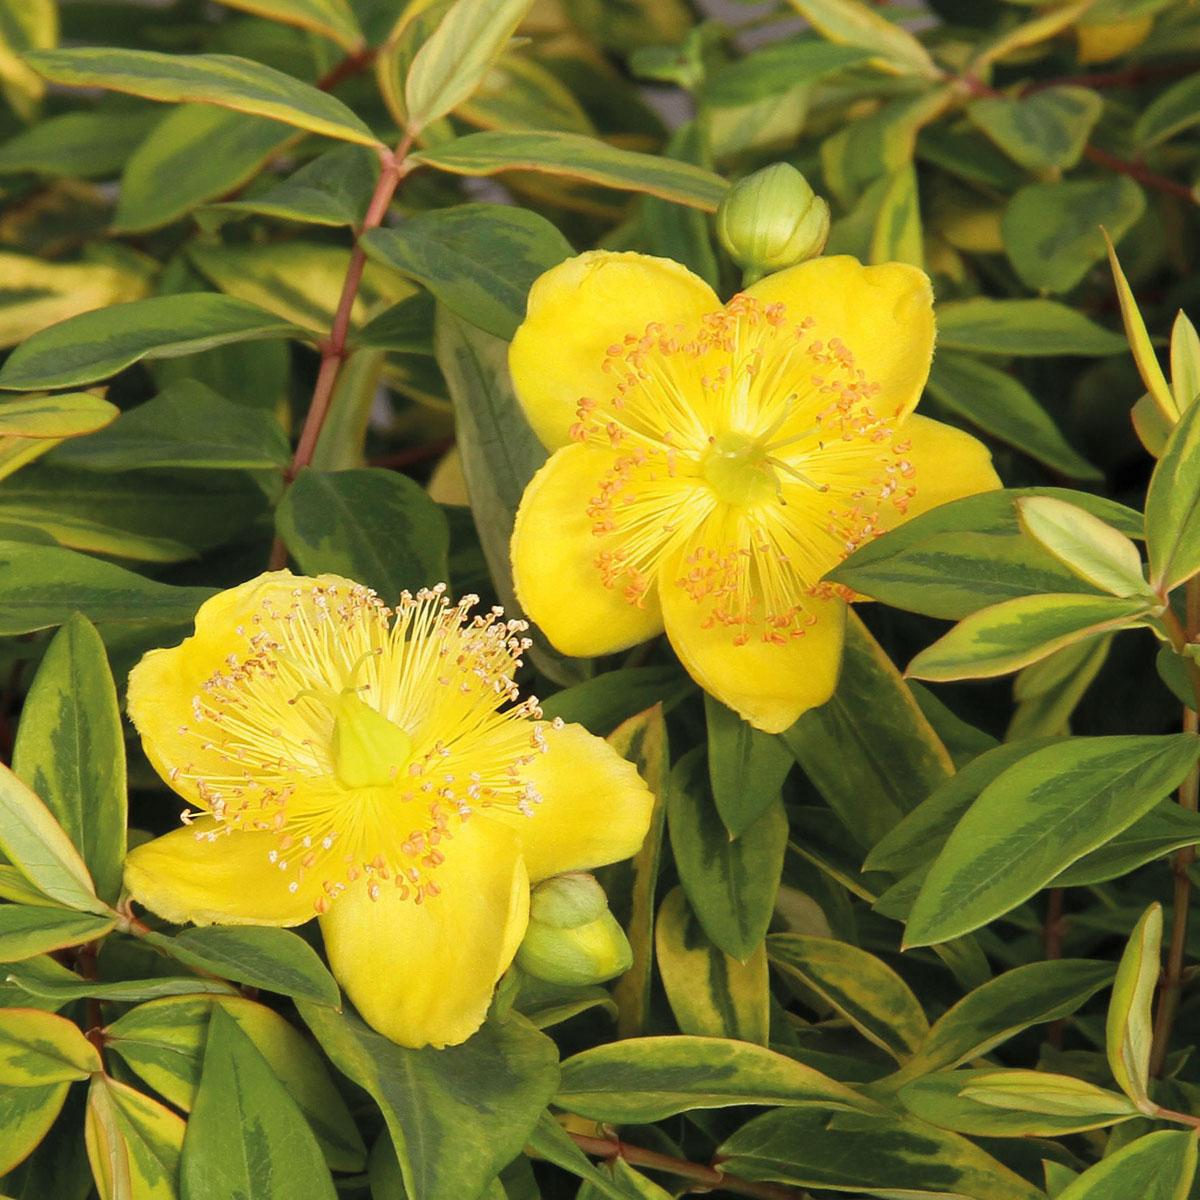 Fiori Gialli Grandi.Globeplanter Hypericum Little Misstery